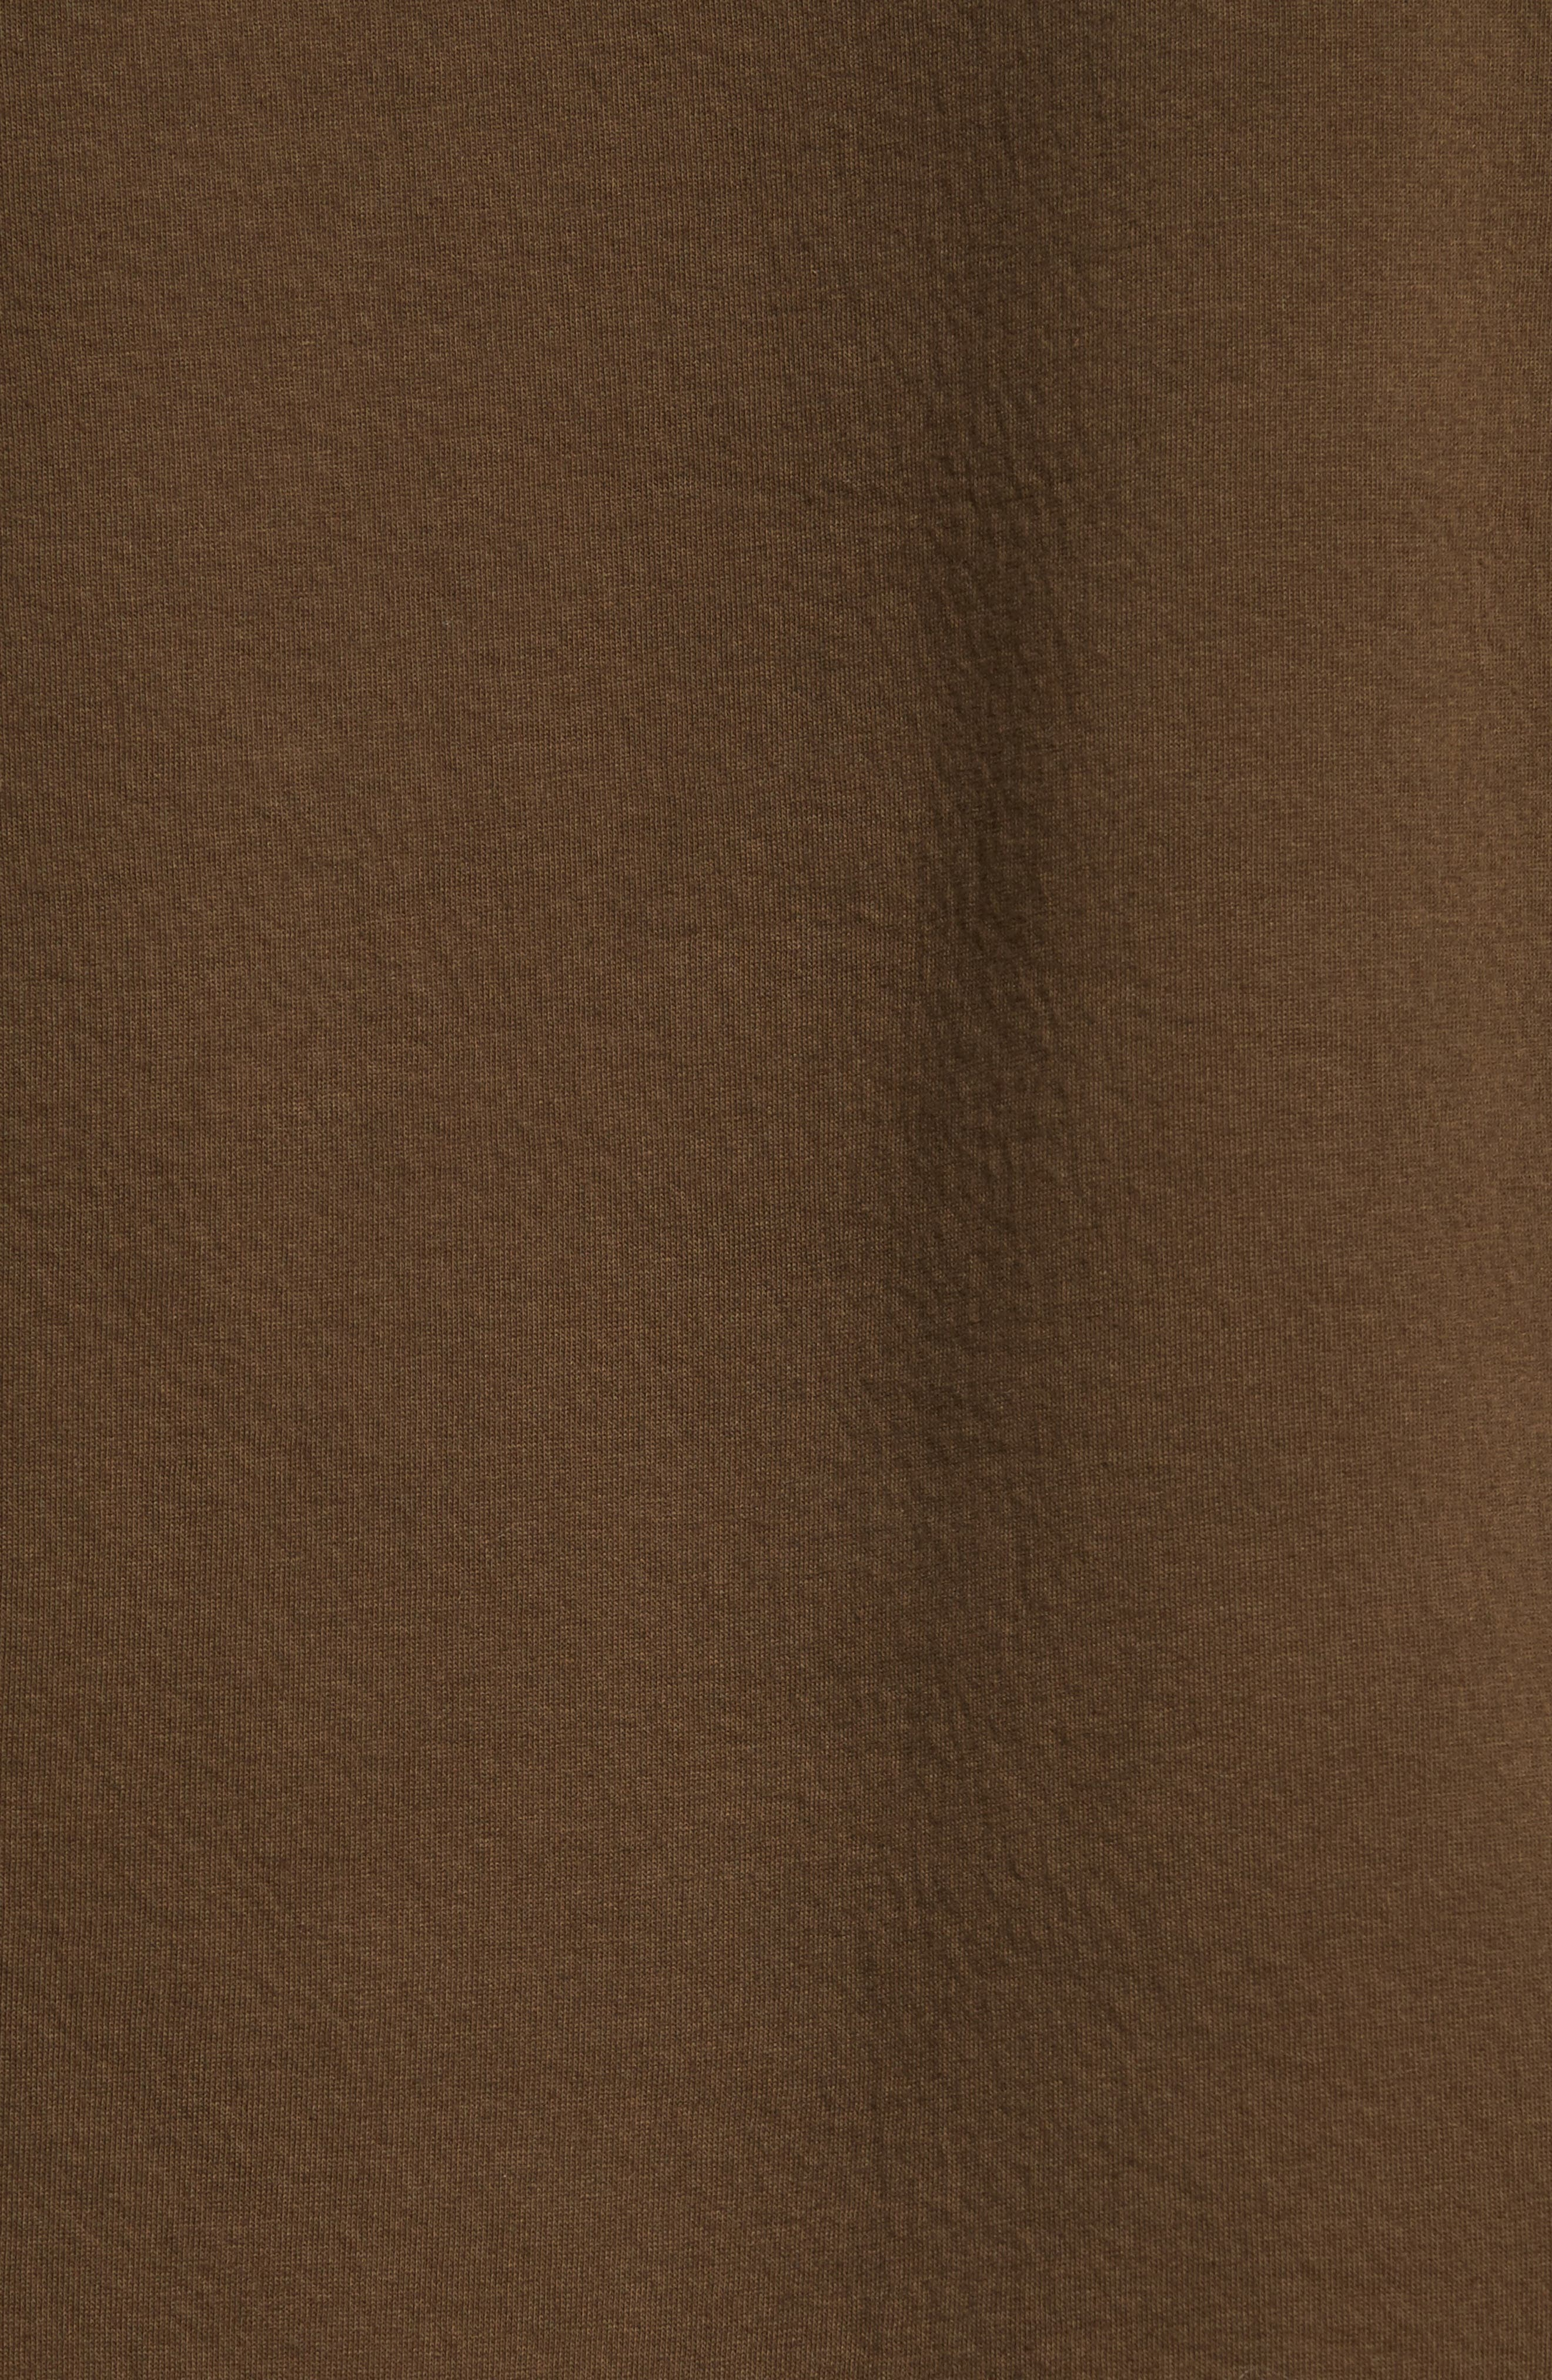 Pullover Hoodie,                             Alternate thumbnail 5, color,                             Dark Olive